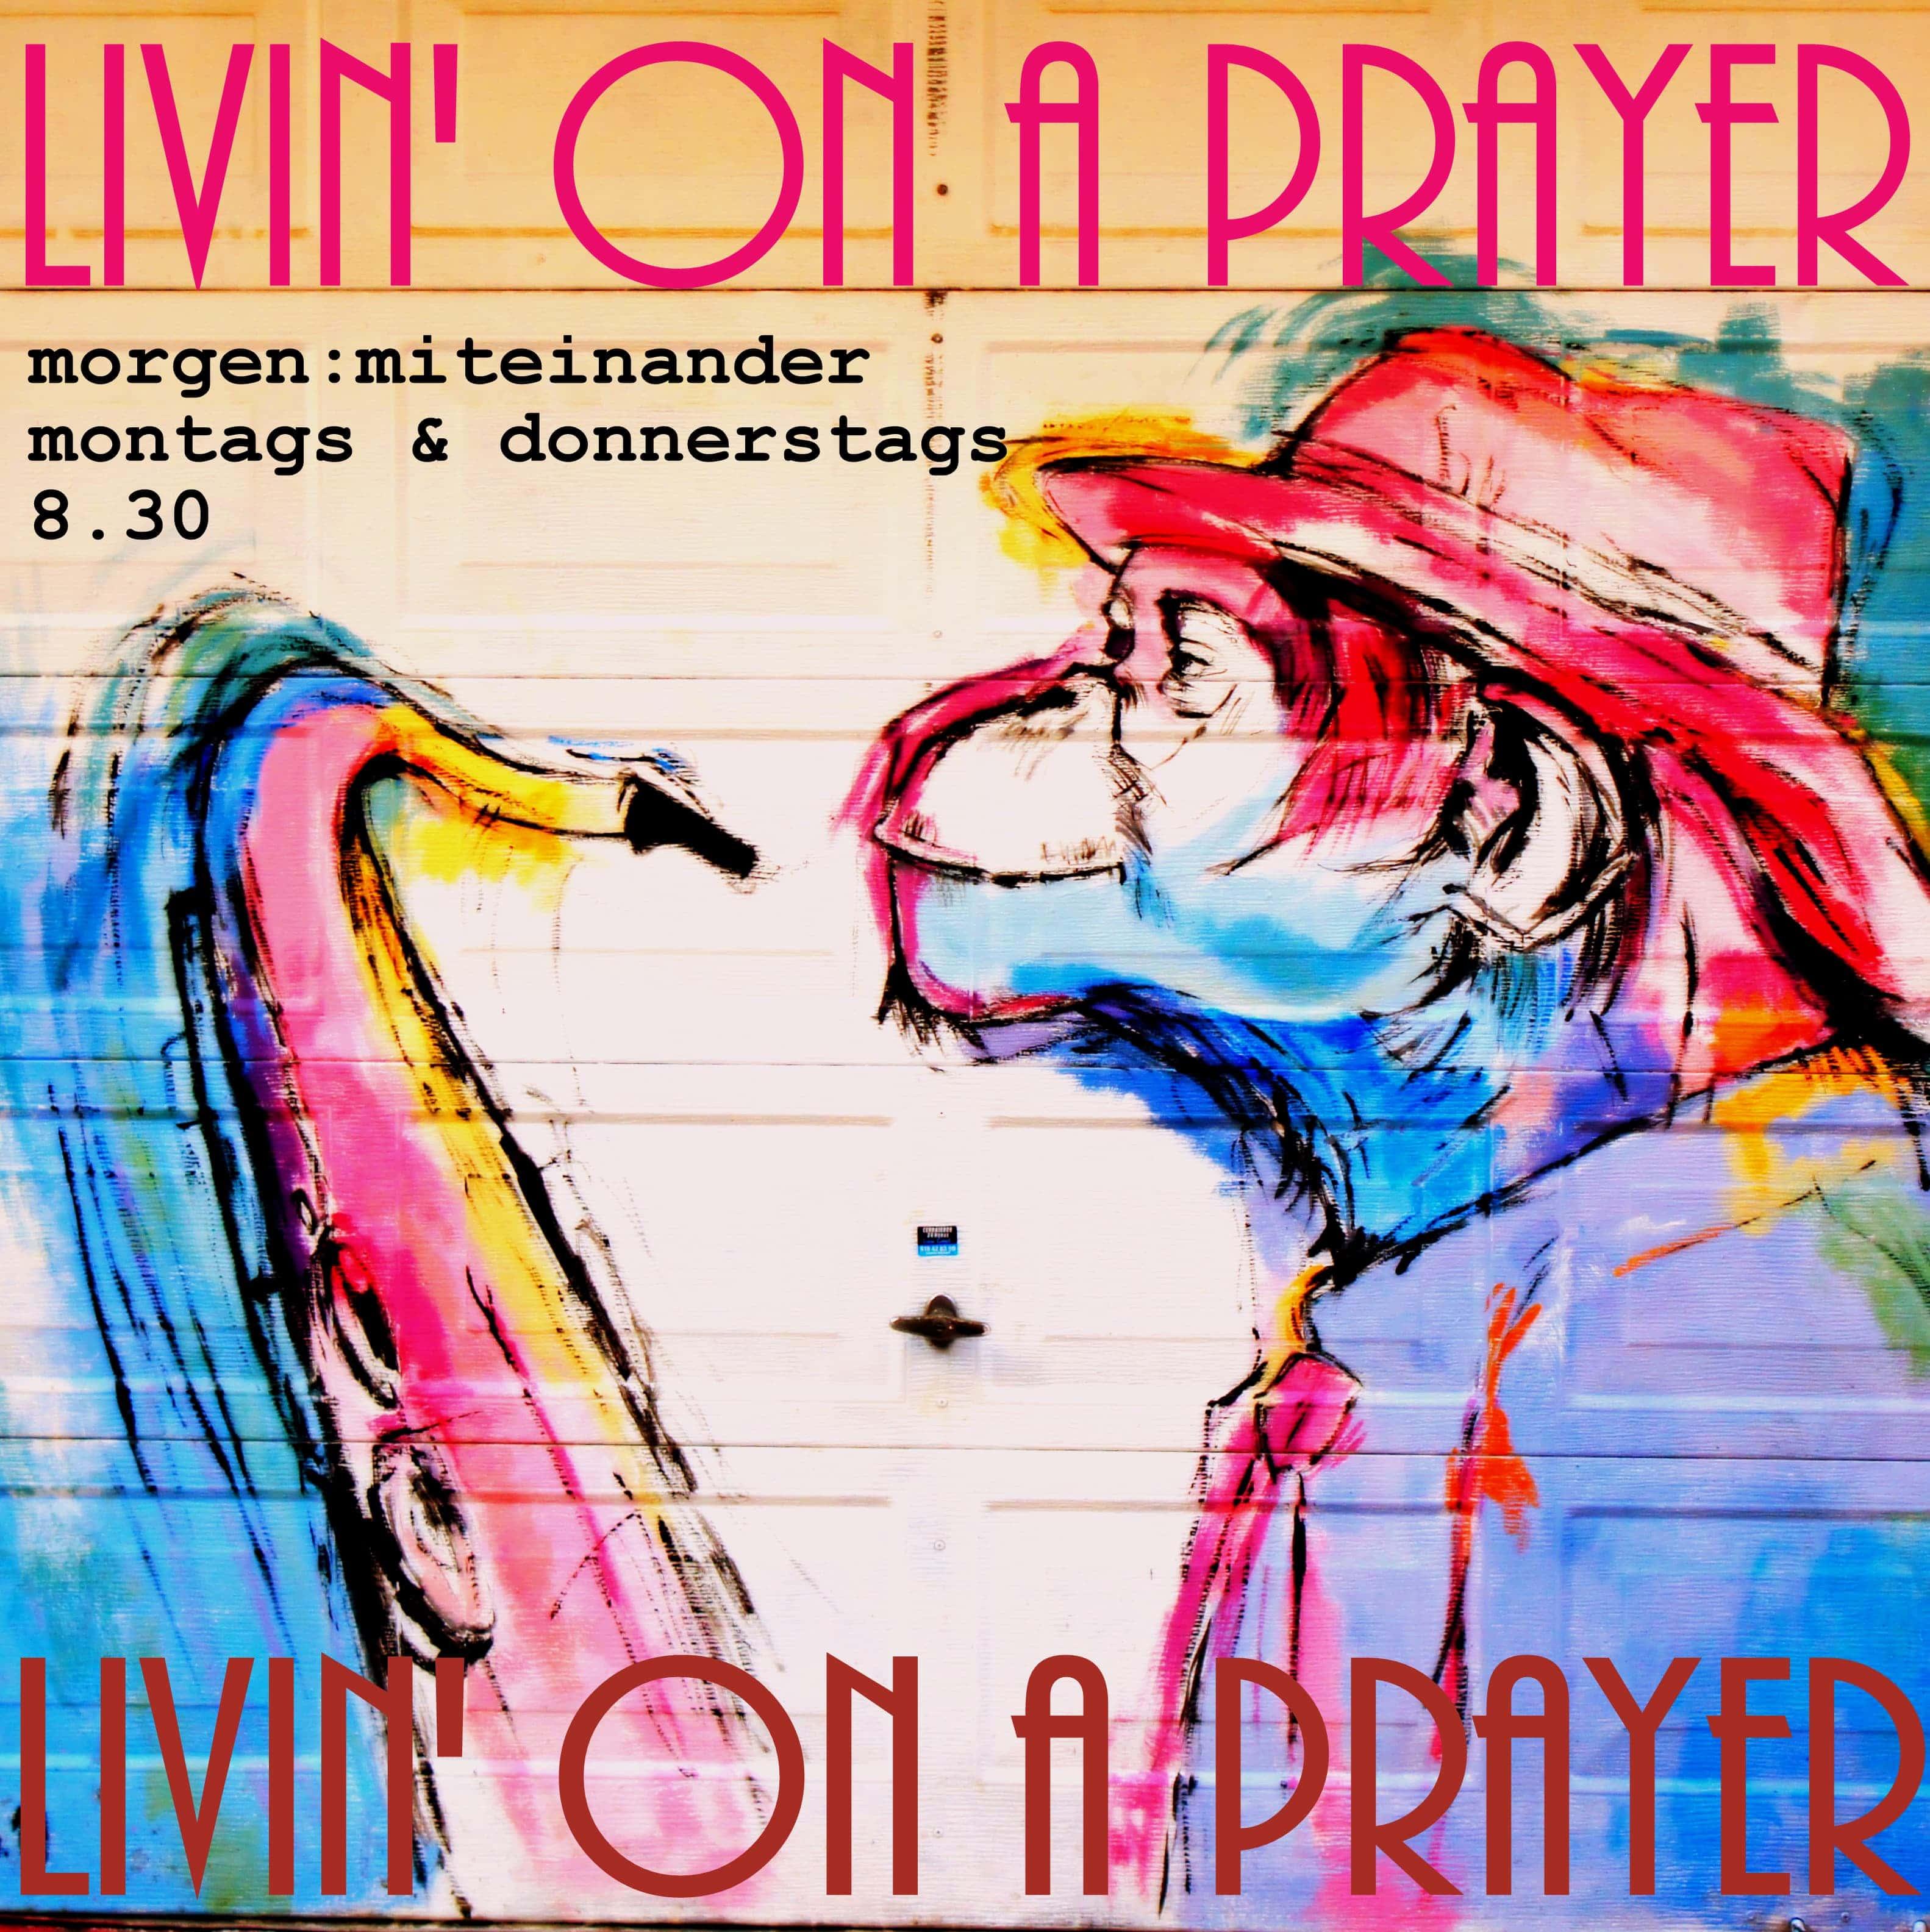 Livin on a prayer